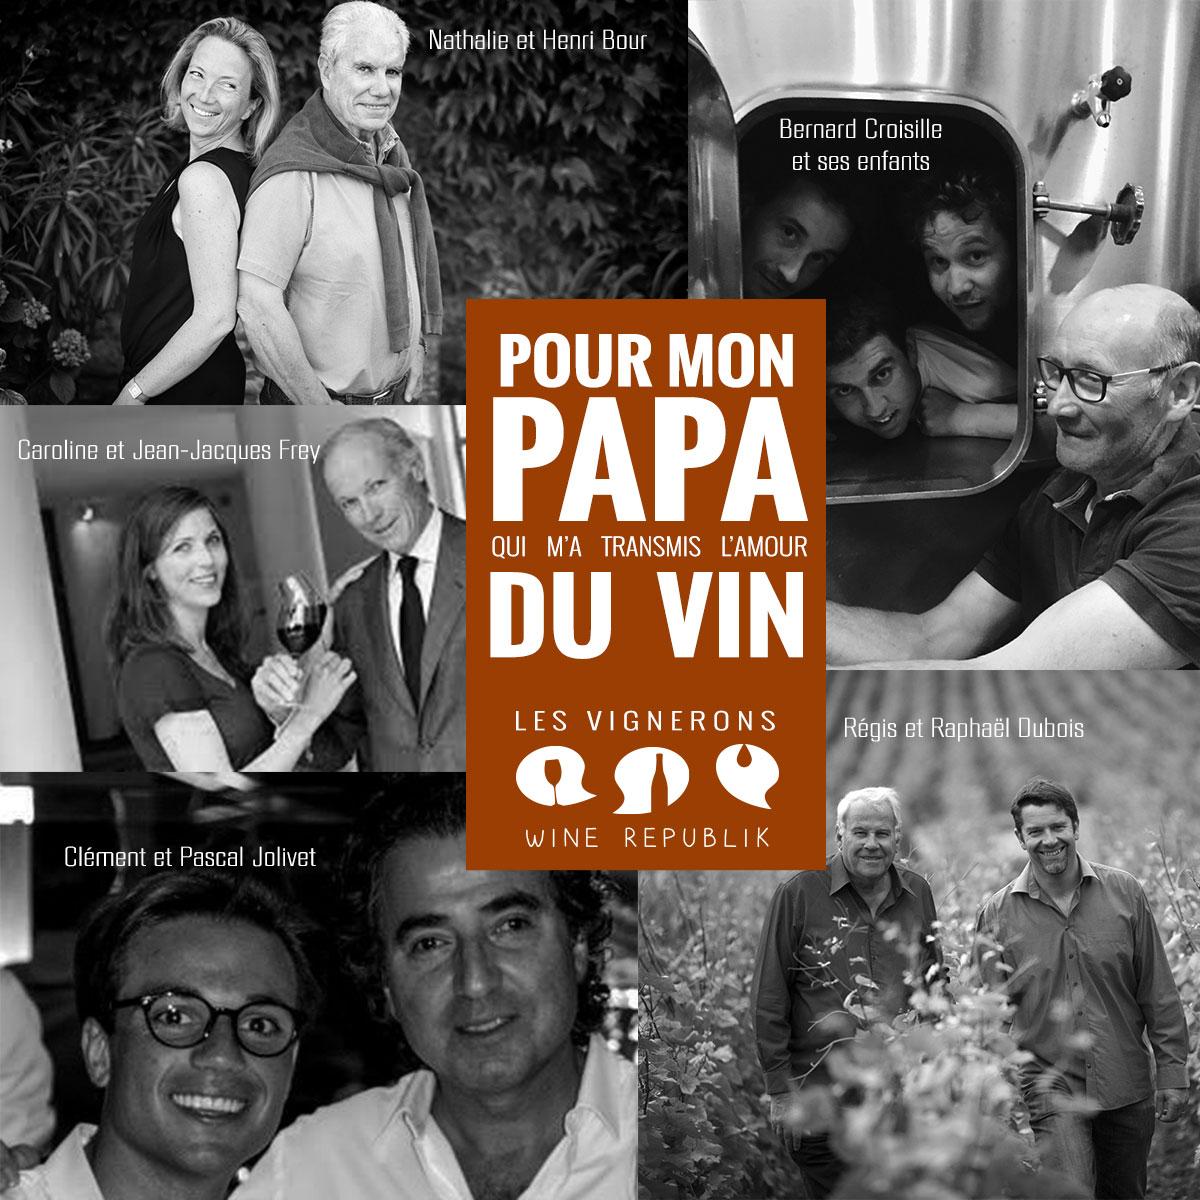 Papa Vigneron